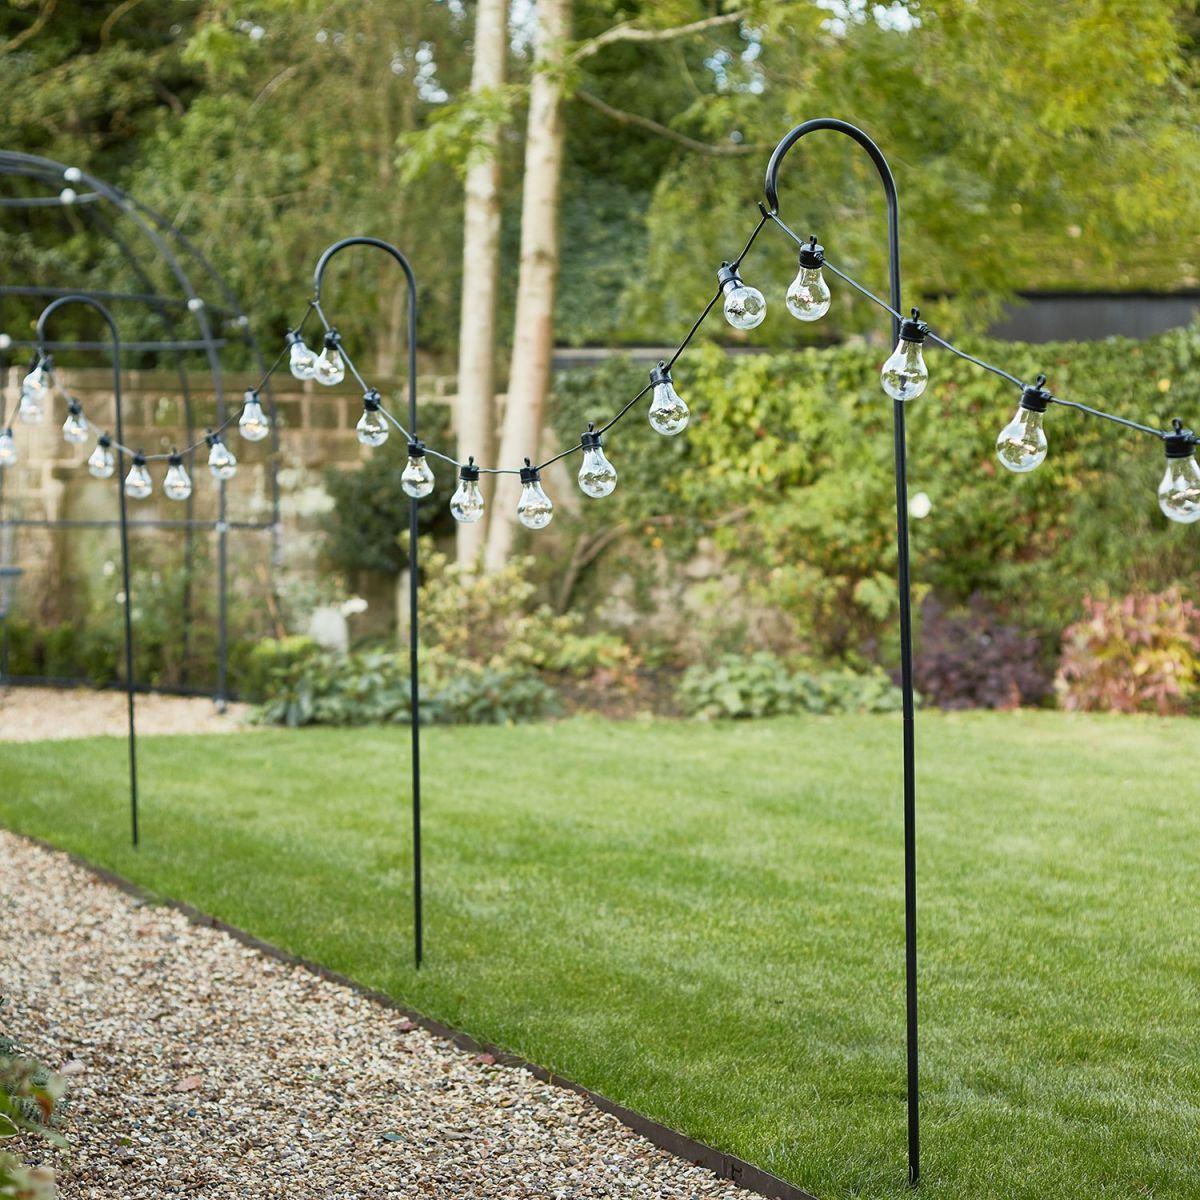 Backyard string light ideas – 10 pretty ways to illuminate your plot